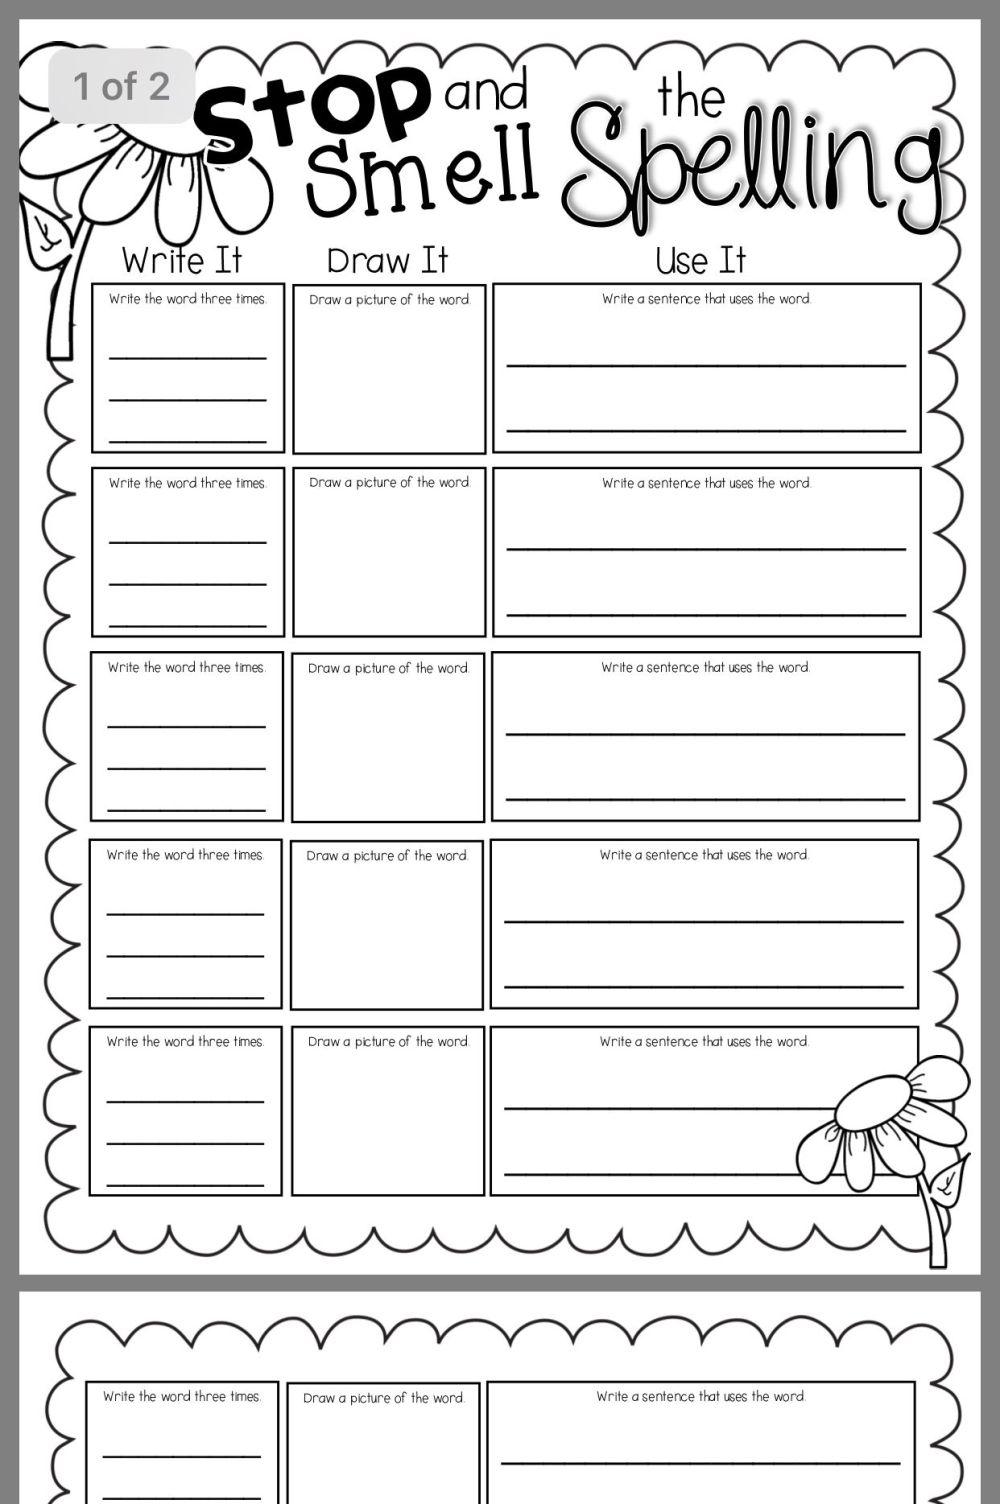 medium resolution of Pin By Rp On Worksheets   Spelling Homework